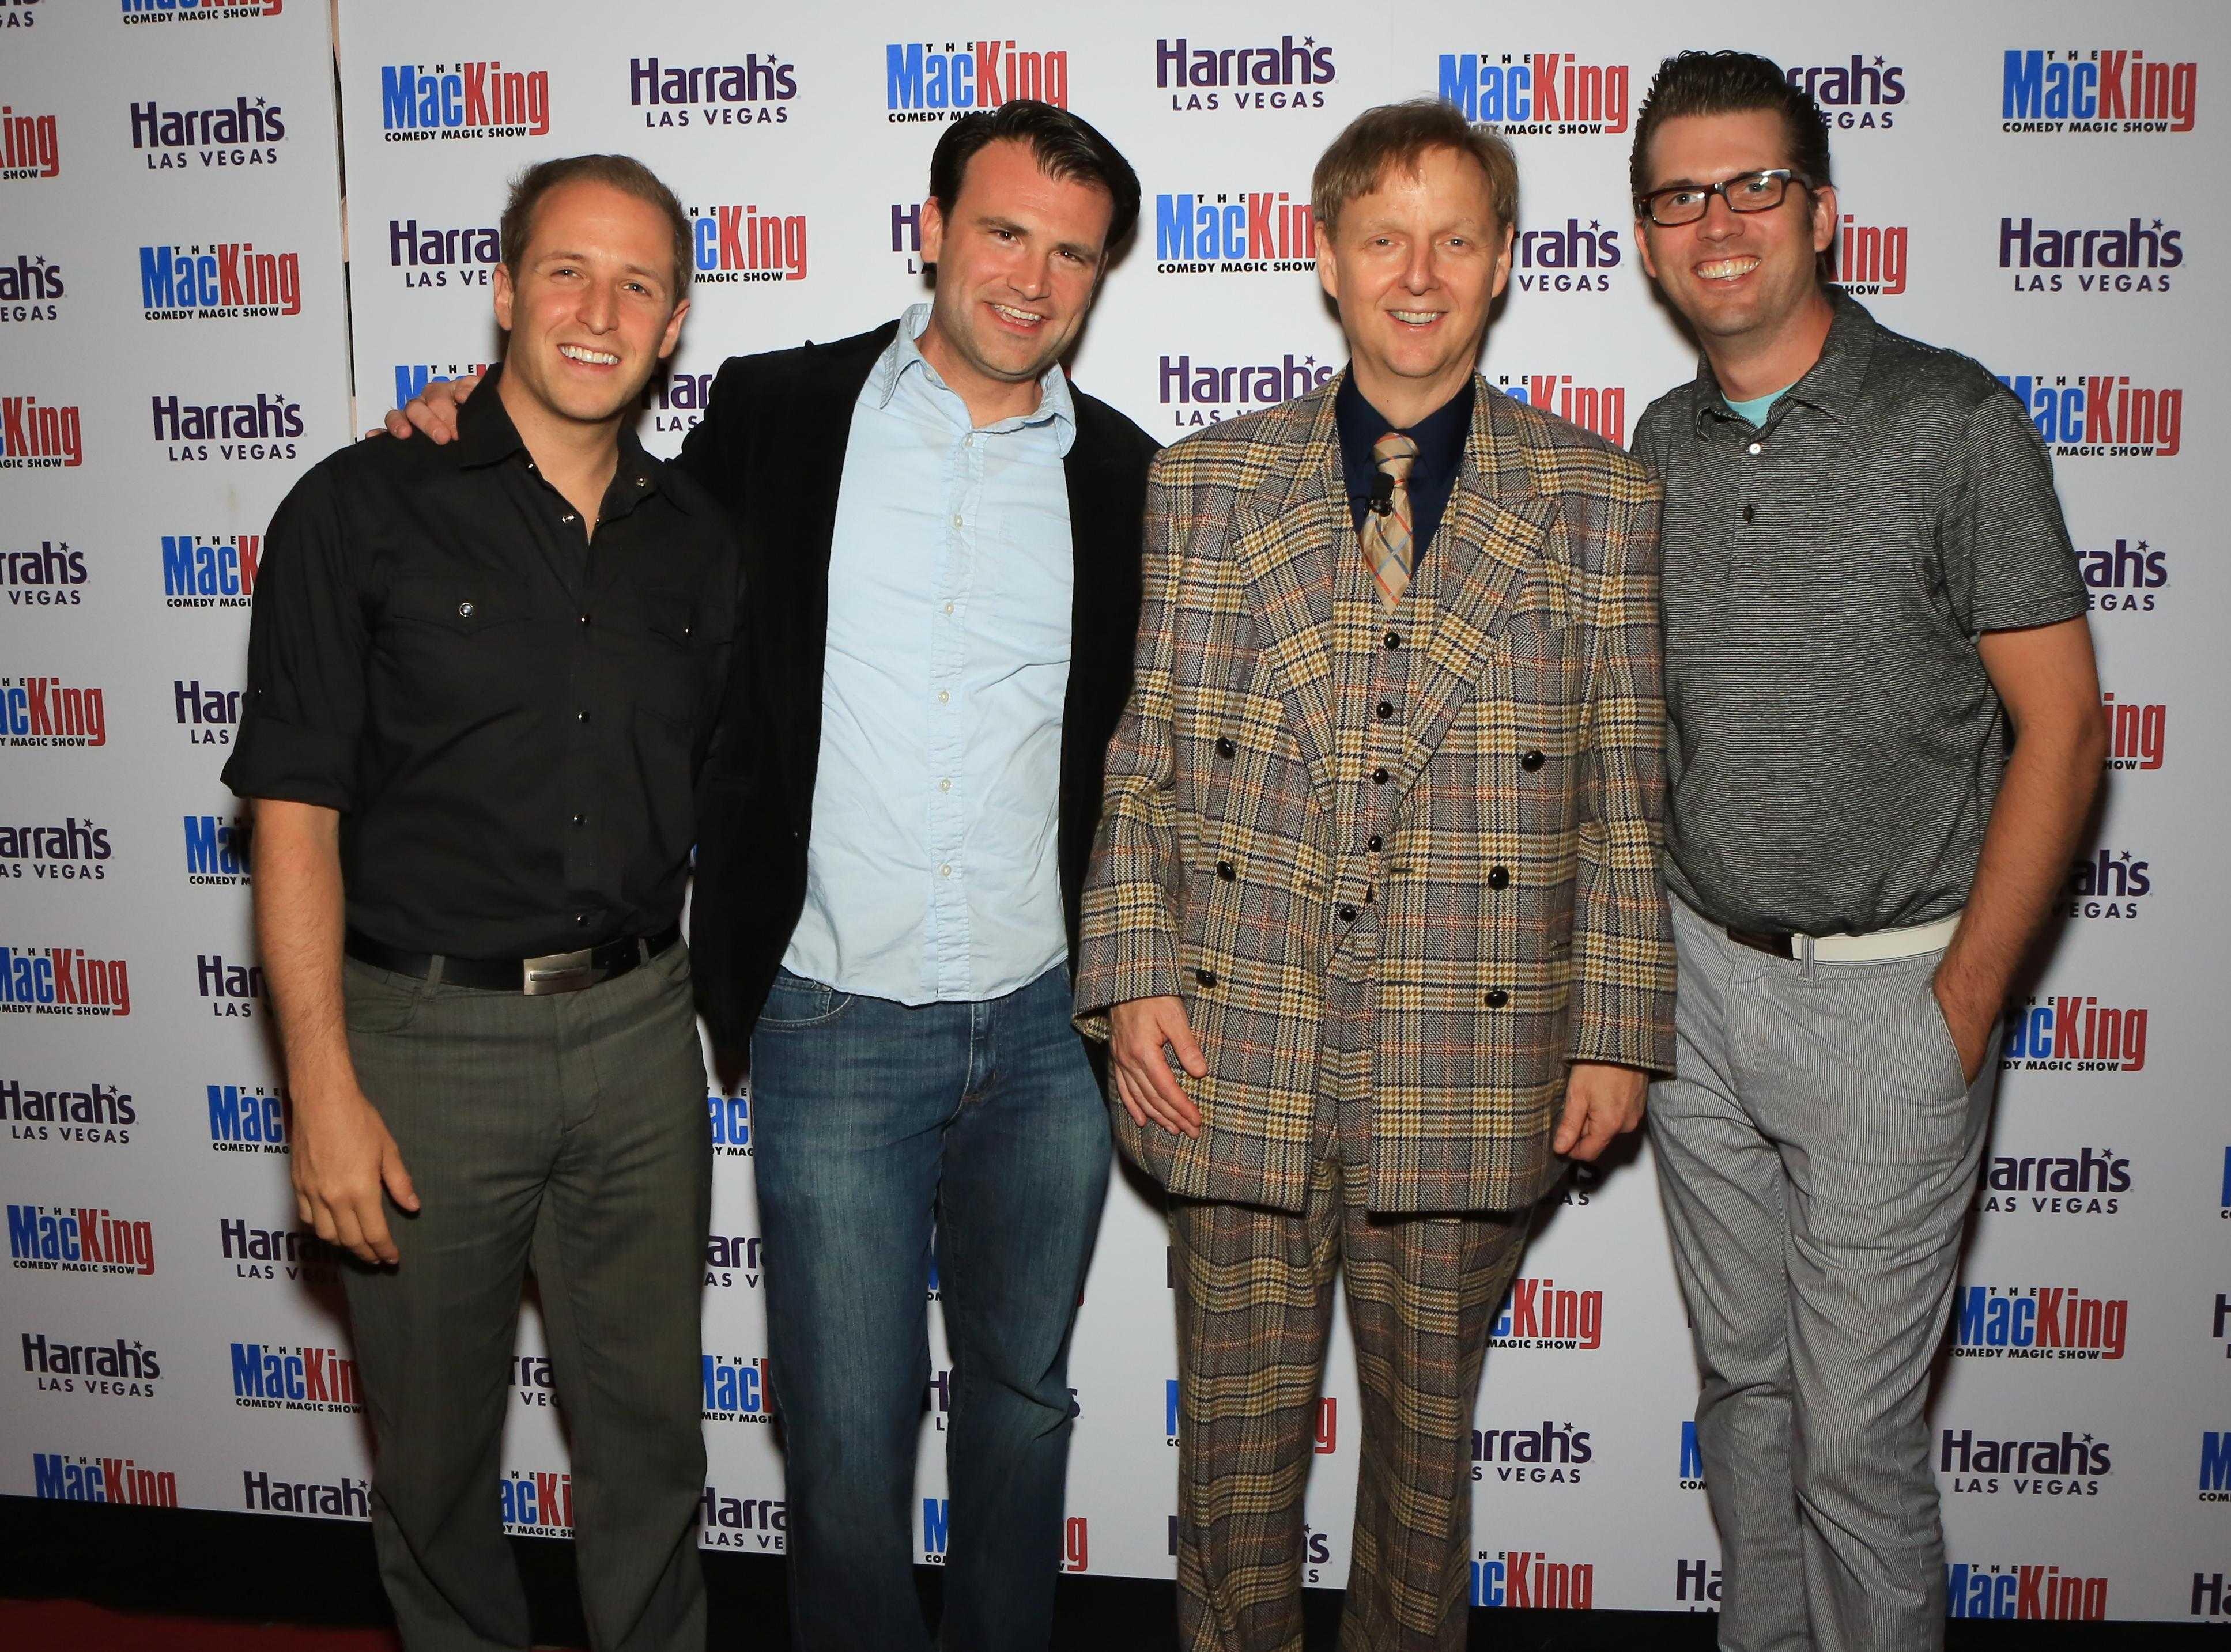 Million Dollar Quartet Cast and Mac King